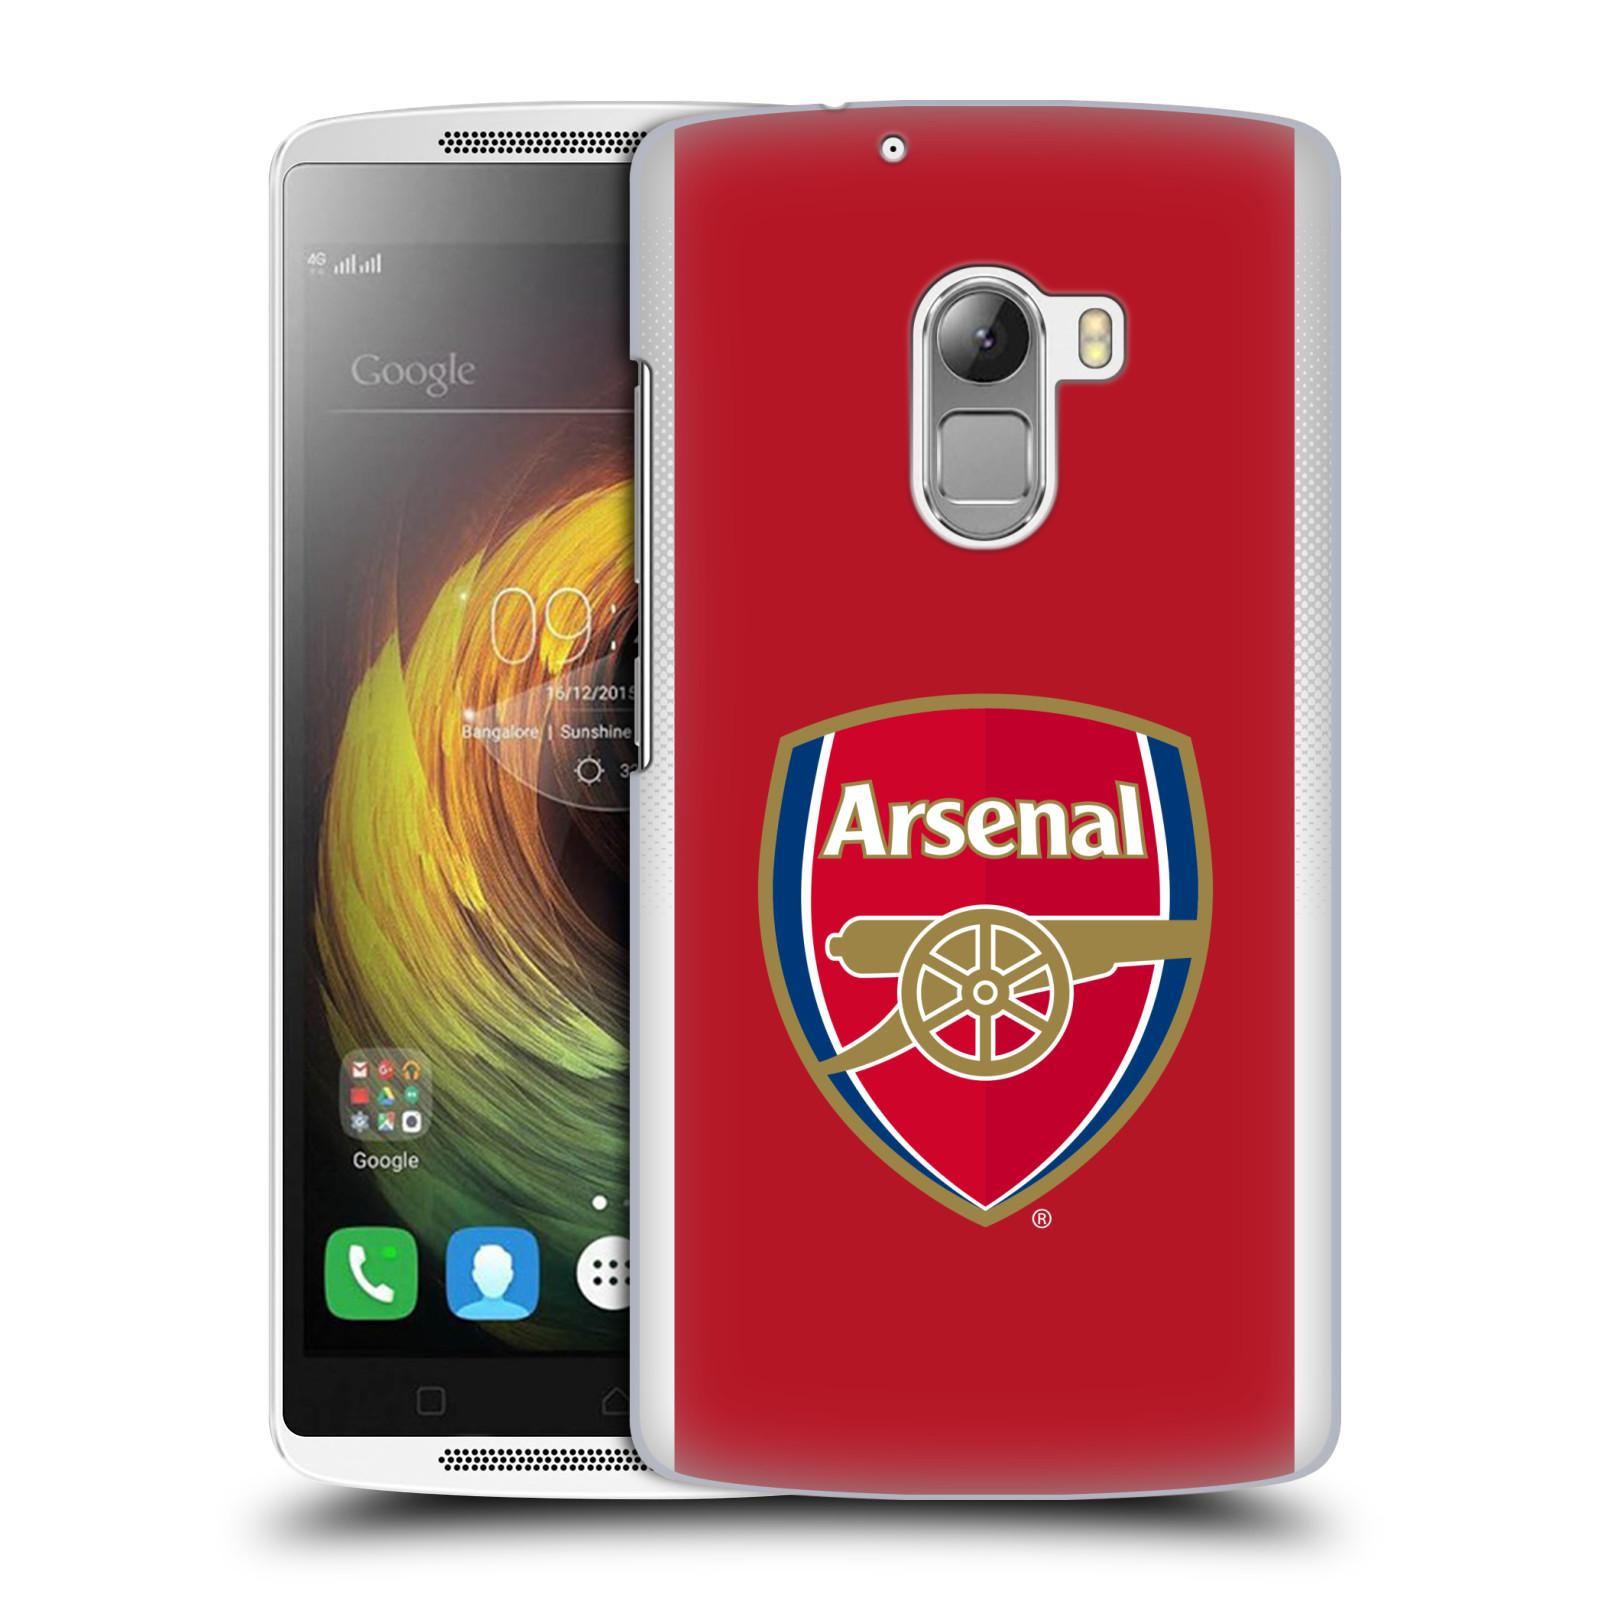 Plastové pouzdro na mobil Lenovo A7010 - Head Case - Arsenal FC - Logo klubu